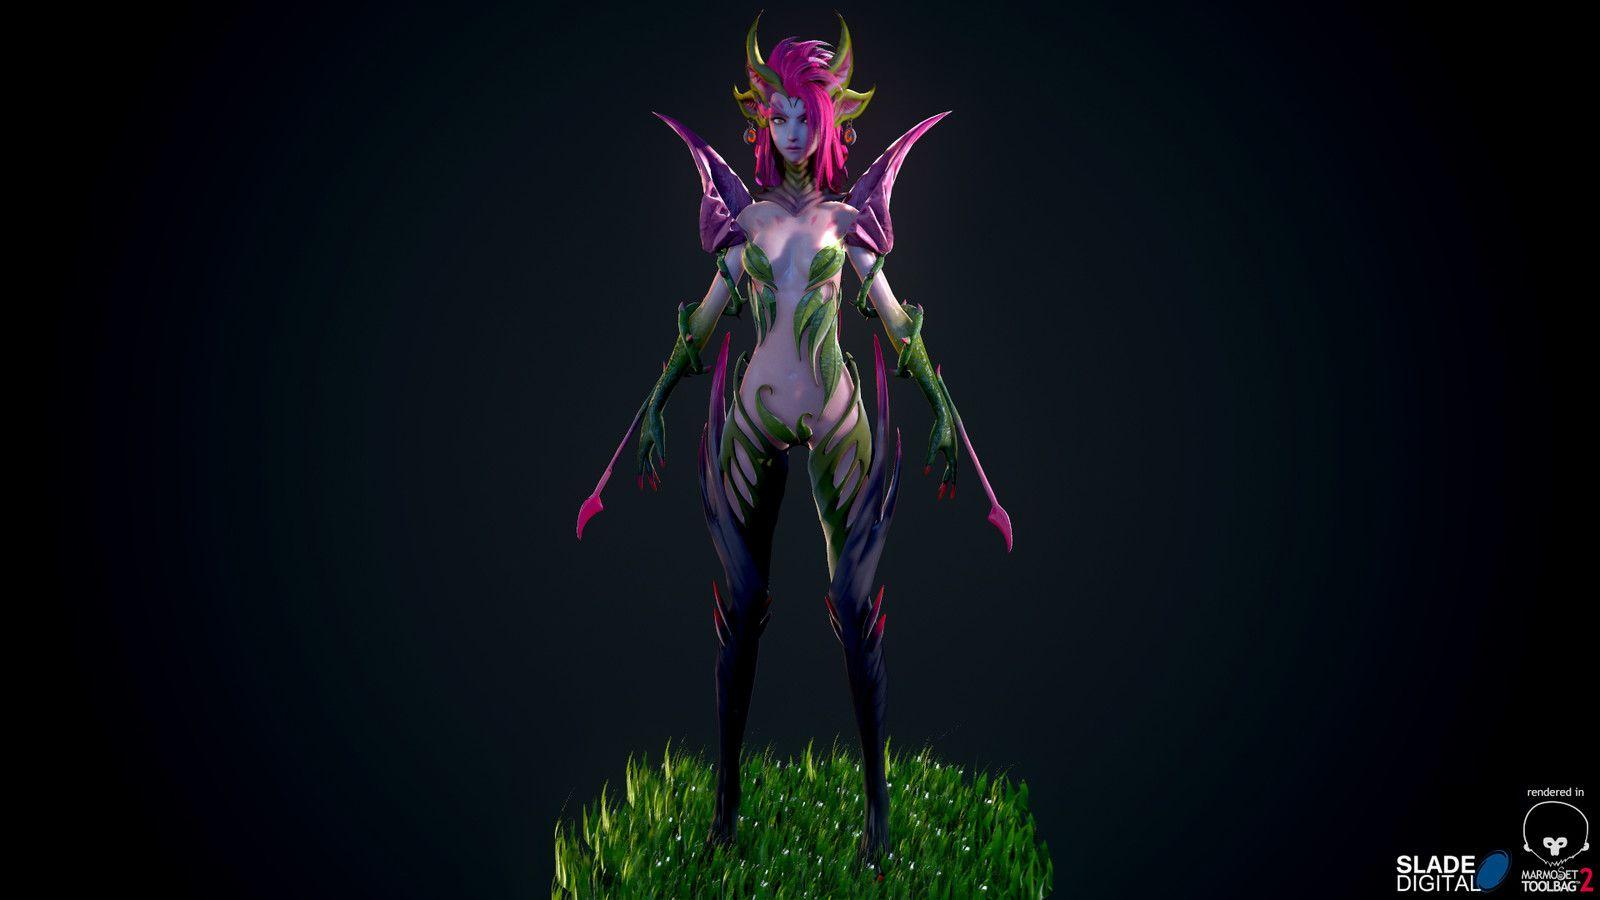 Zyra Rise of Thorns, Slade Digital on ArtStation at https://www.artstation.com/artwork/zyra-rise-of-thorns